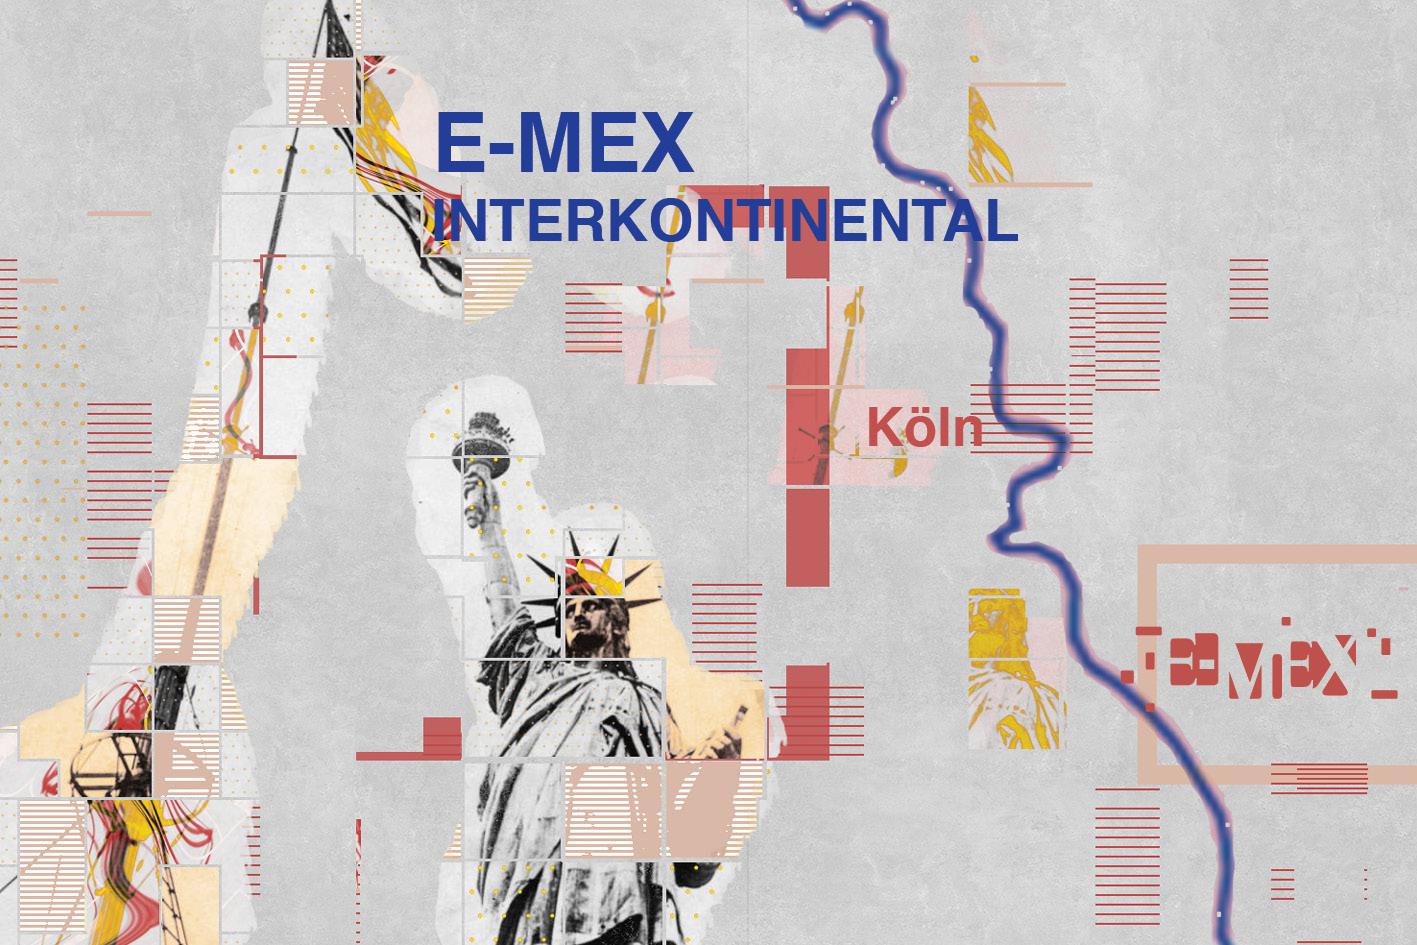 E-MEX INTERKONTINENTAL